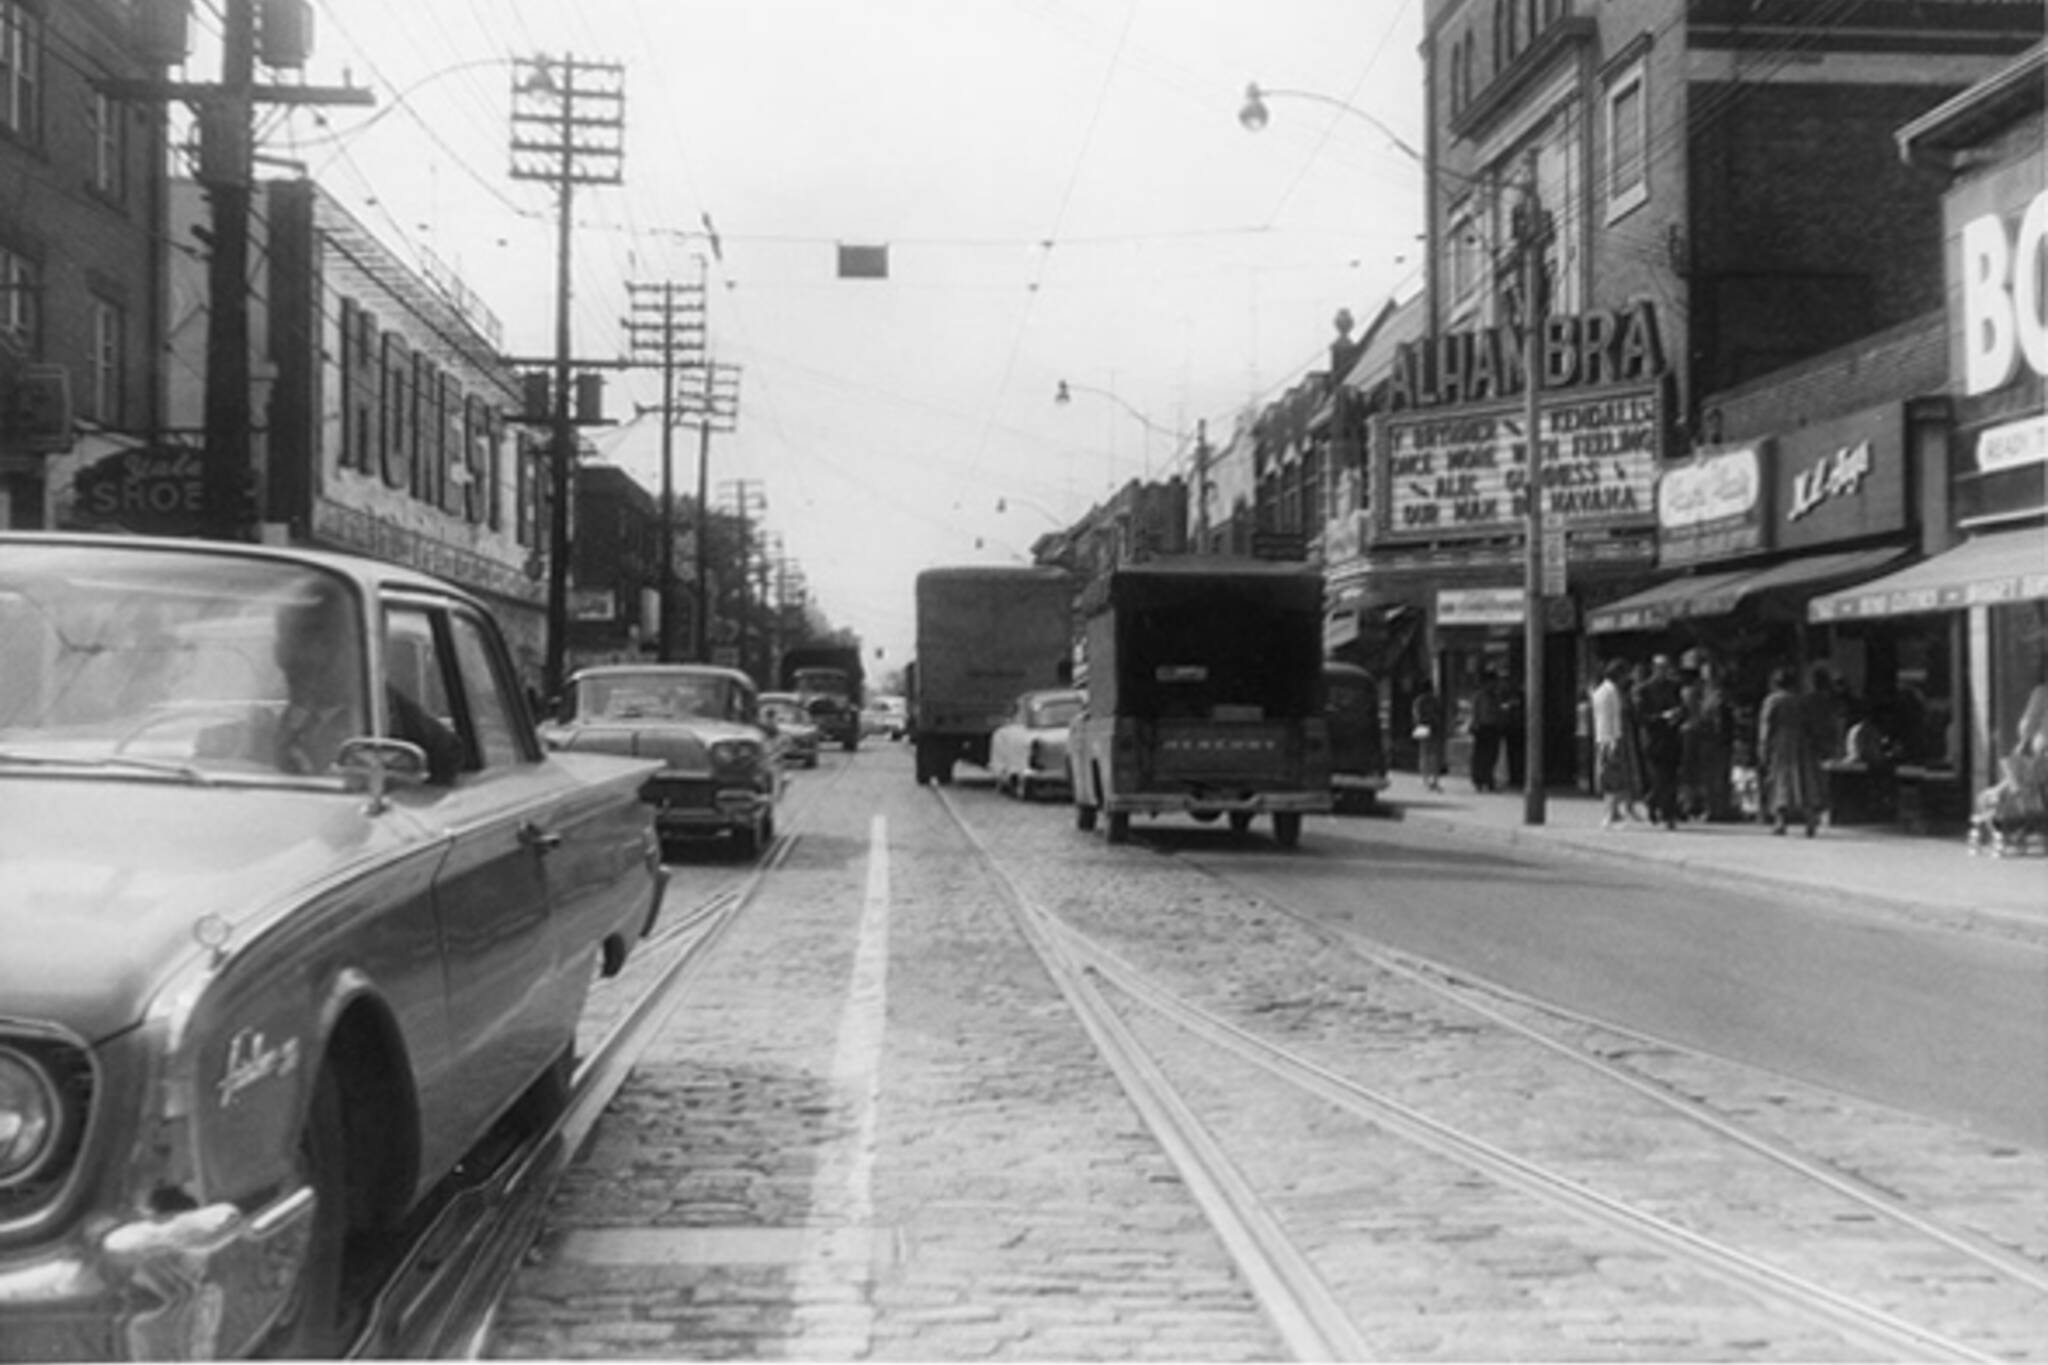 Annex Toronto, 1950s